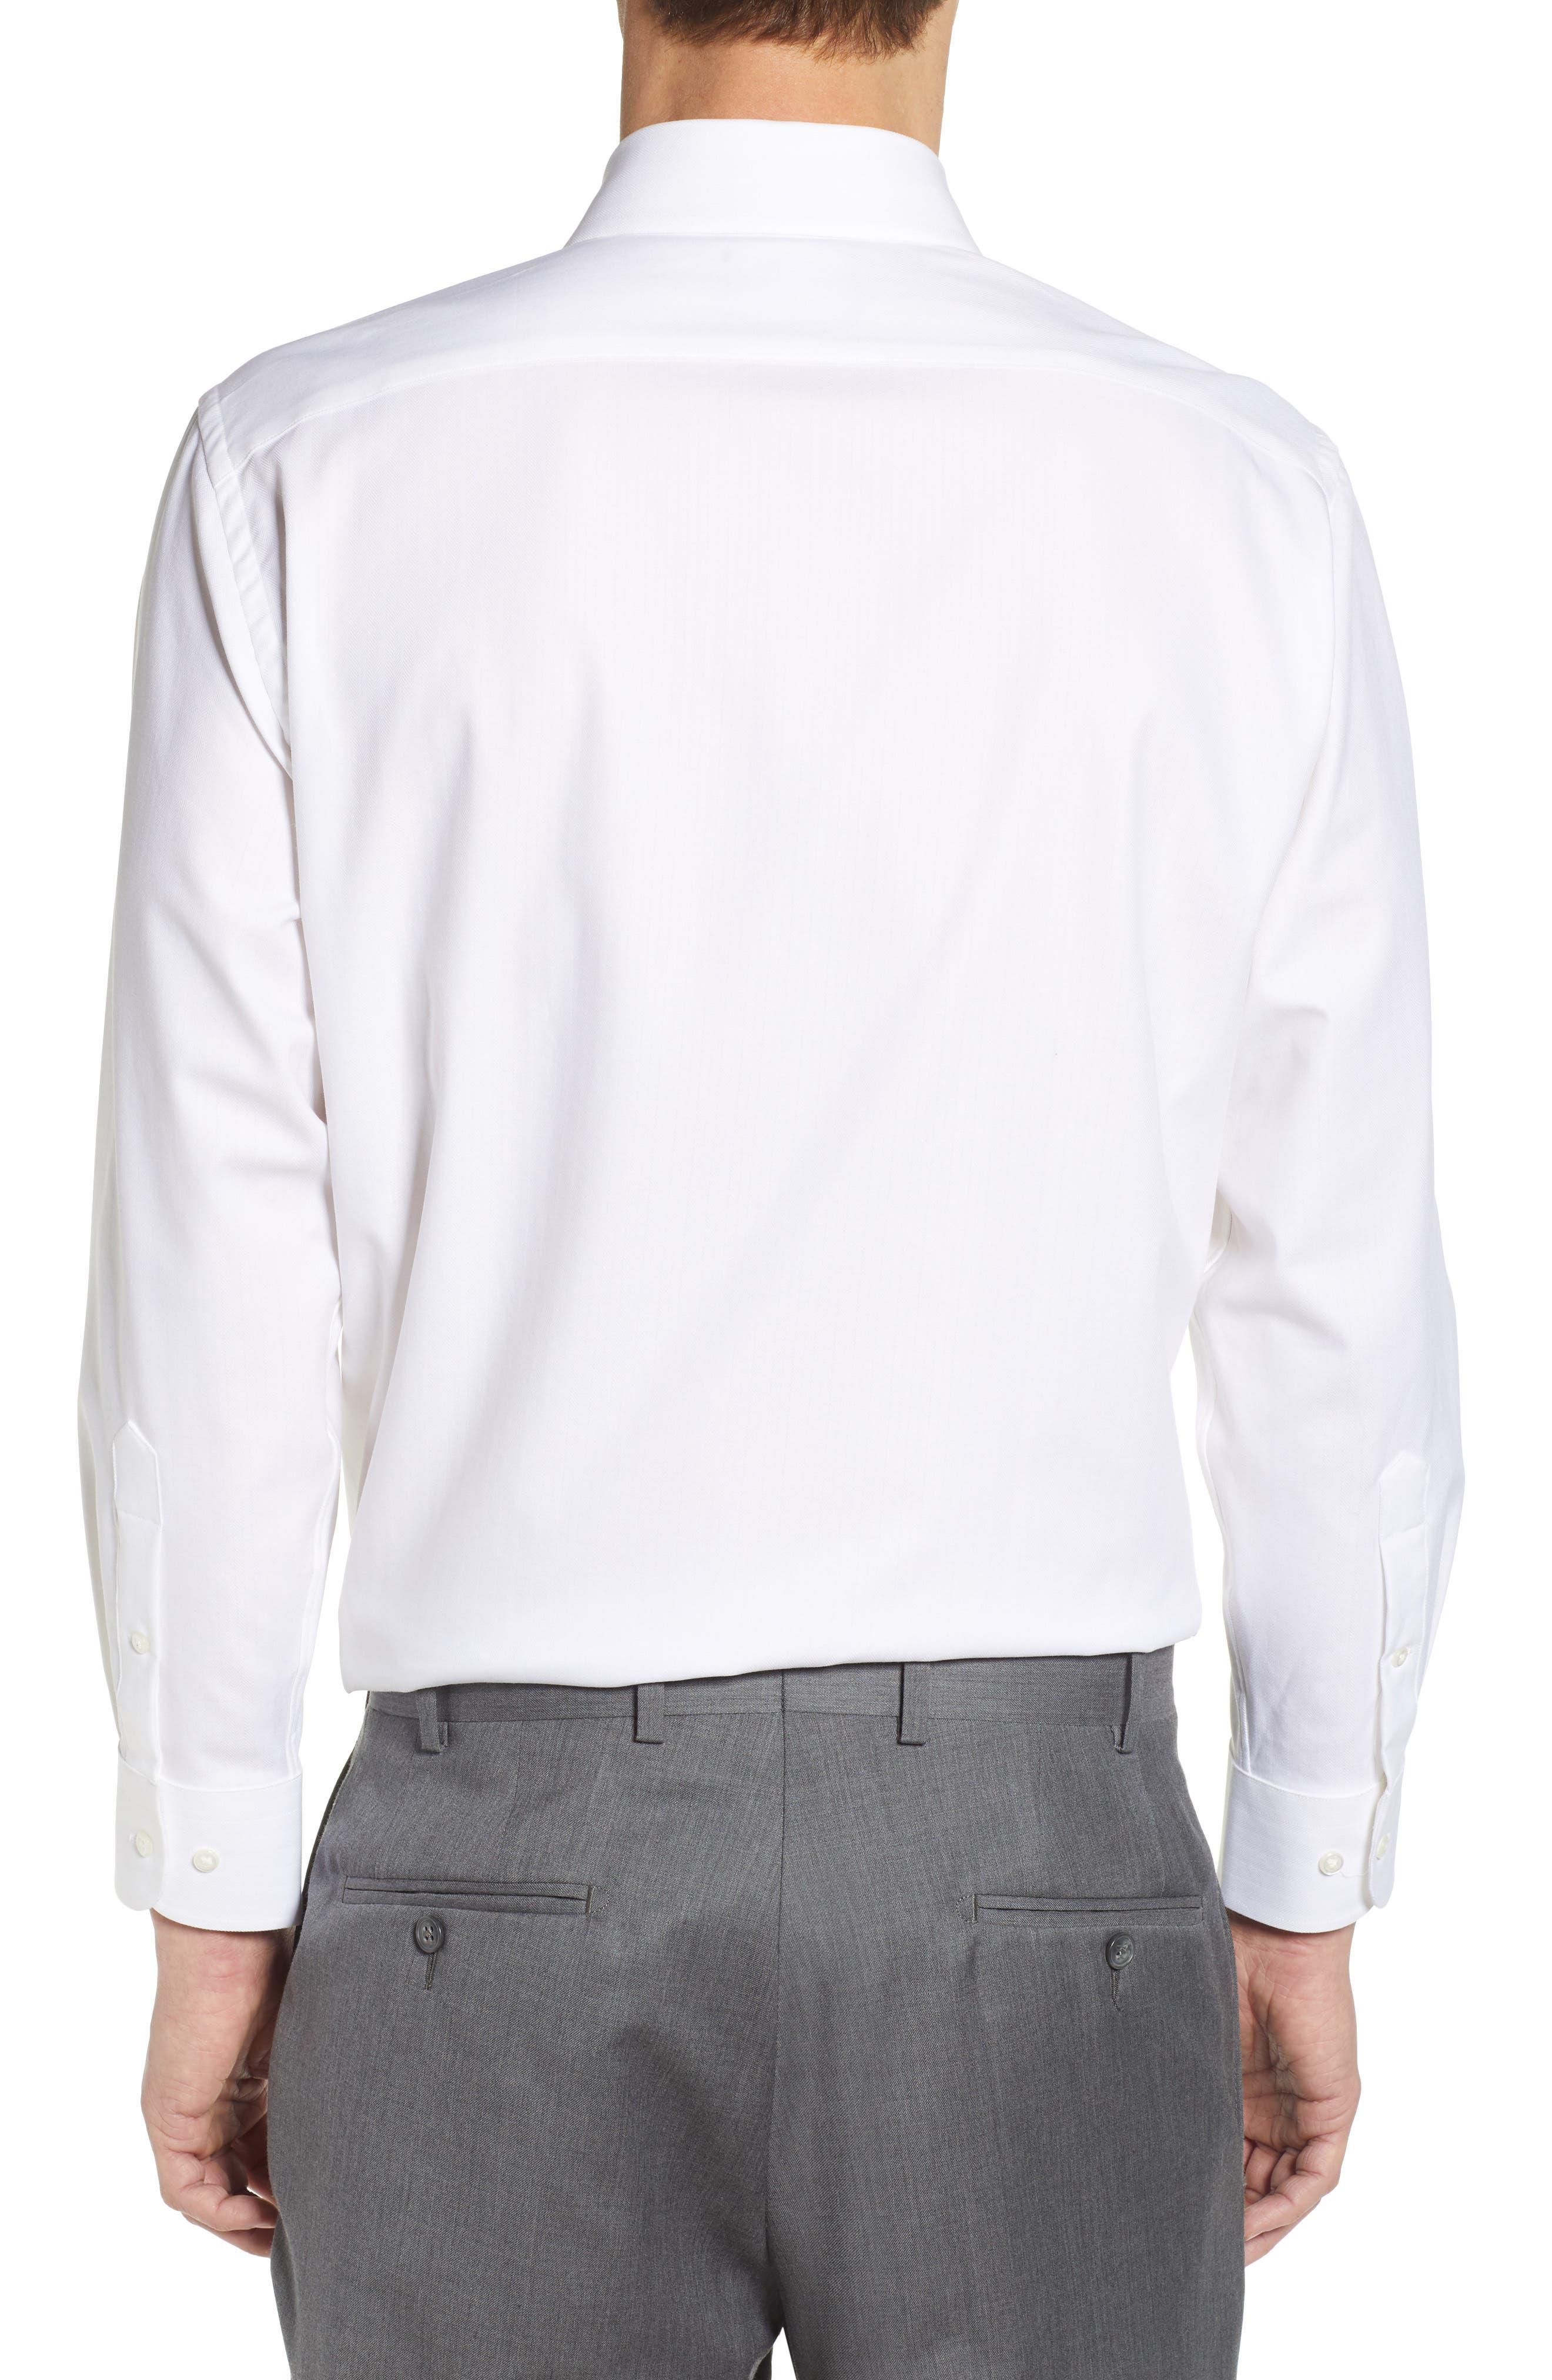 NORDSTROM MEN'S SHOP, Tech-Smart Traditional Fit Stretch Herringbone Dress Shirt, Alternate thumbnail 3, color, WHITE